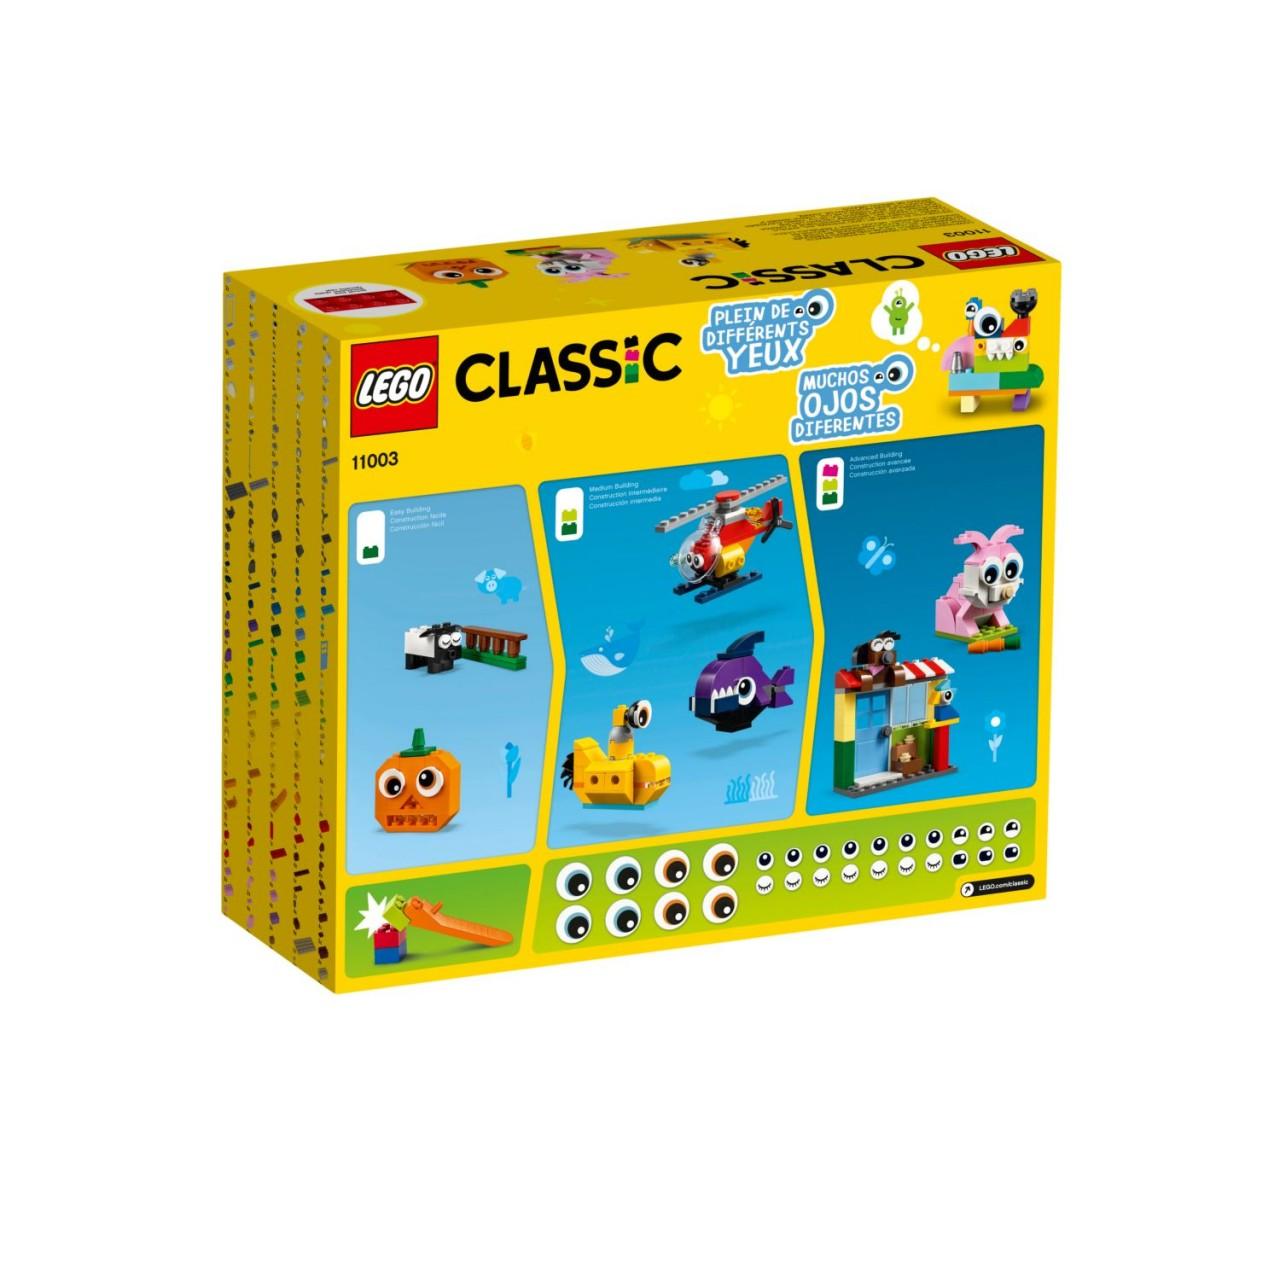 LEGO CLASSIC 11003 Bausteine